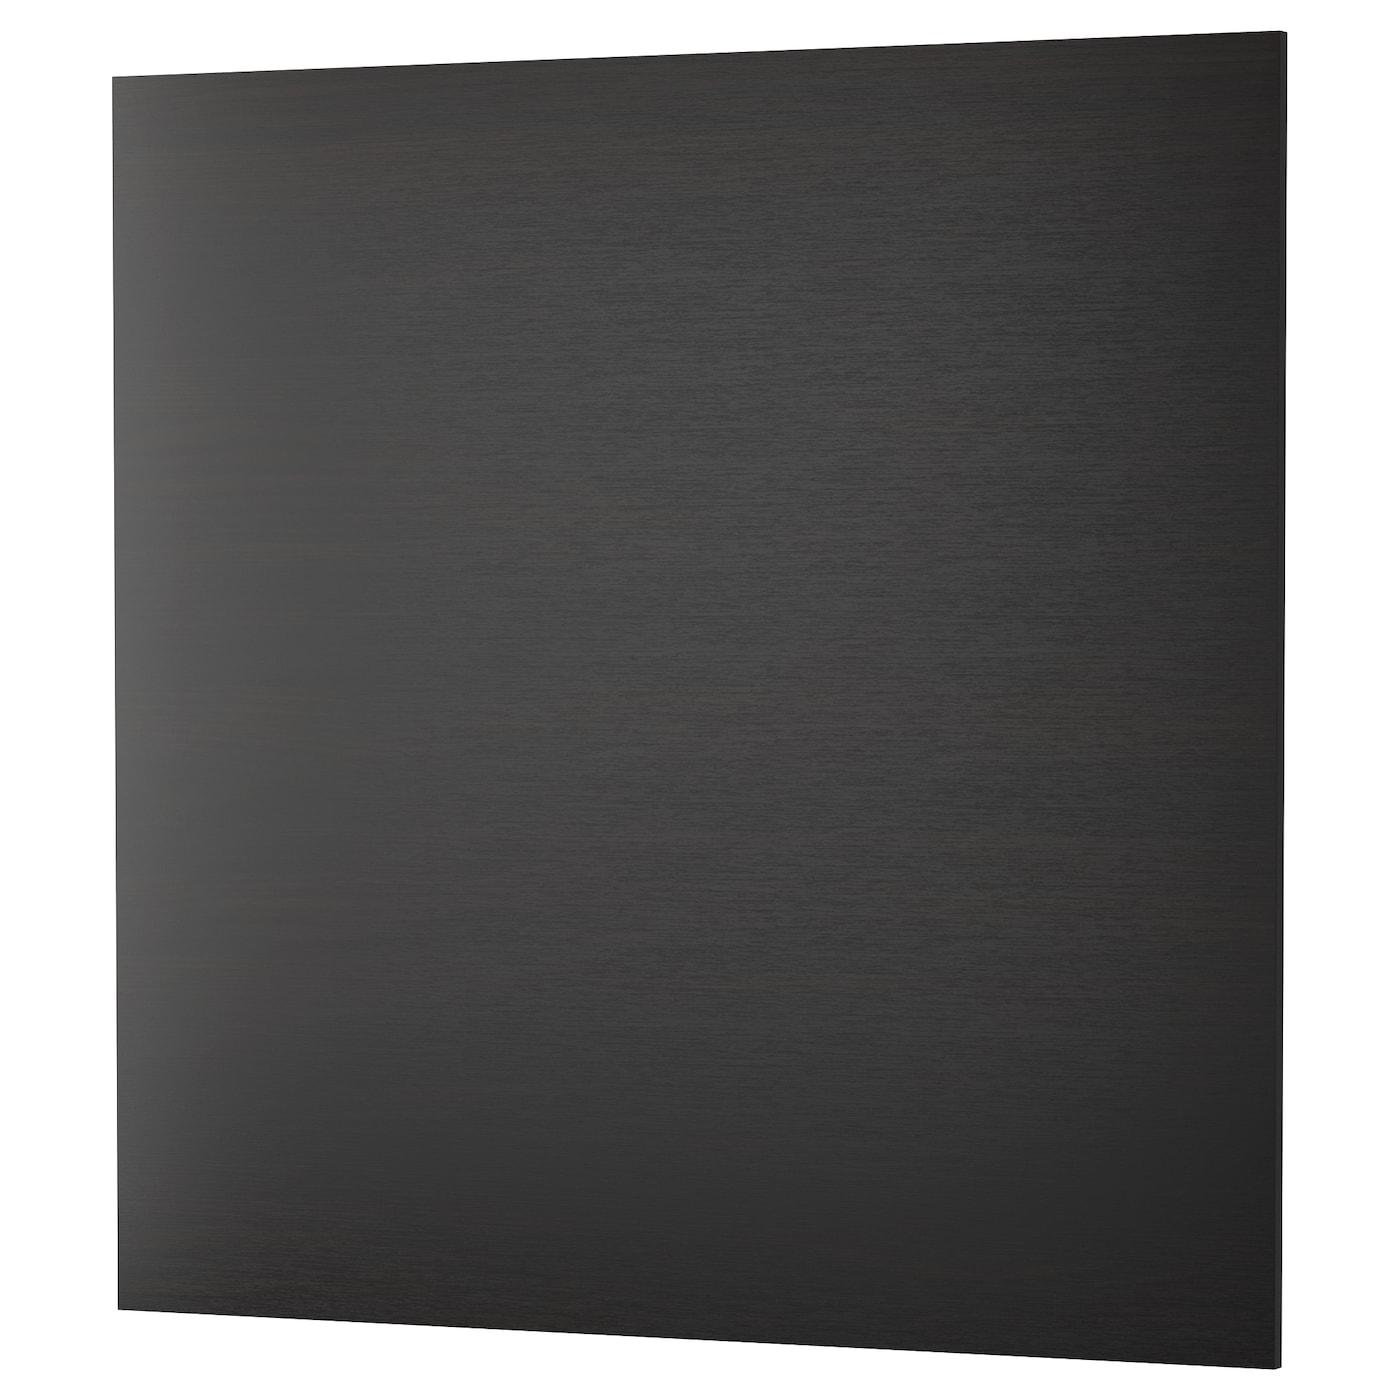 sibbarp rev tement mural sur mesure brun noir stratifi 1 m ikea. Black Bedroom Furniture Sets. Home Design Ideas